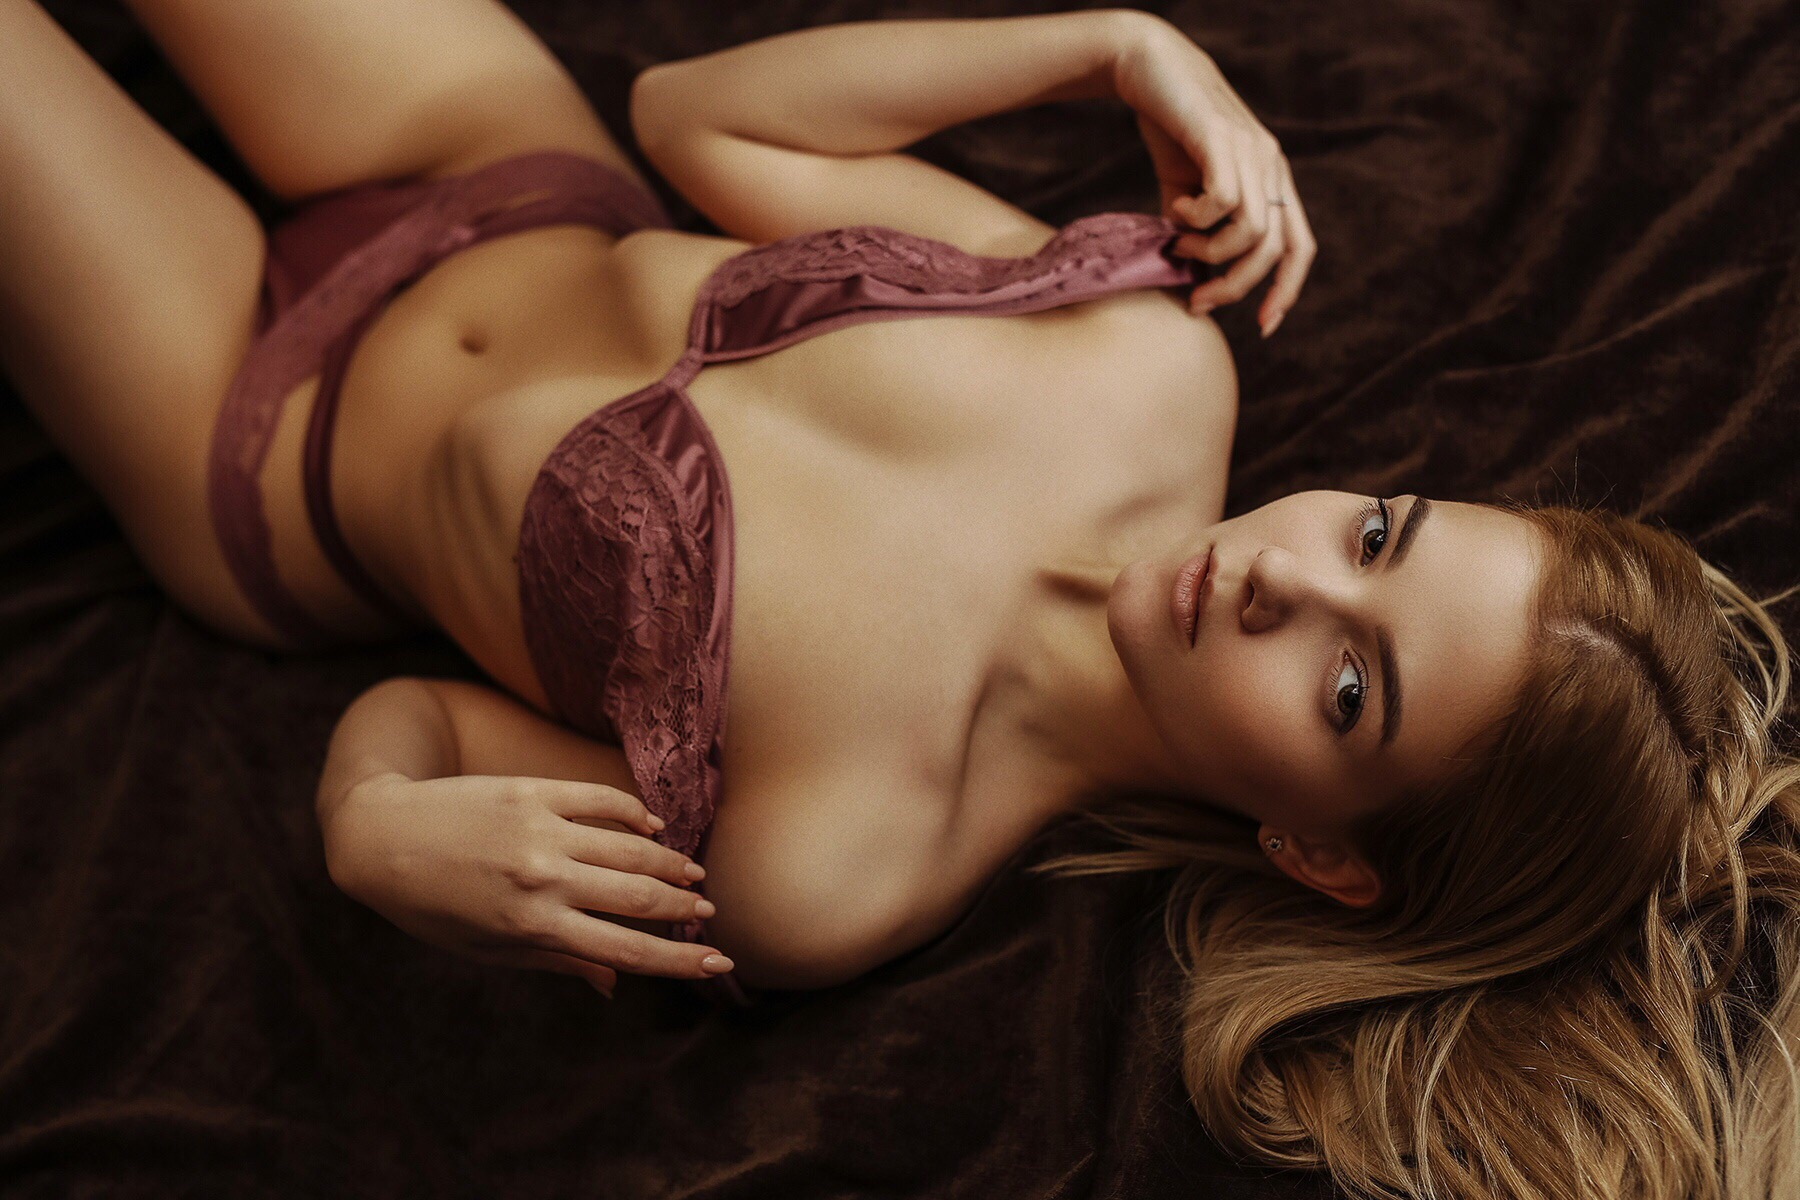 Anabel Alonso Hot victoria sokolovaalexander shlezinger - portraits of girls